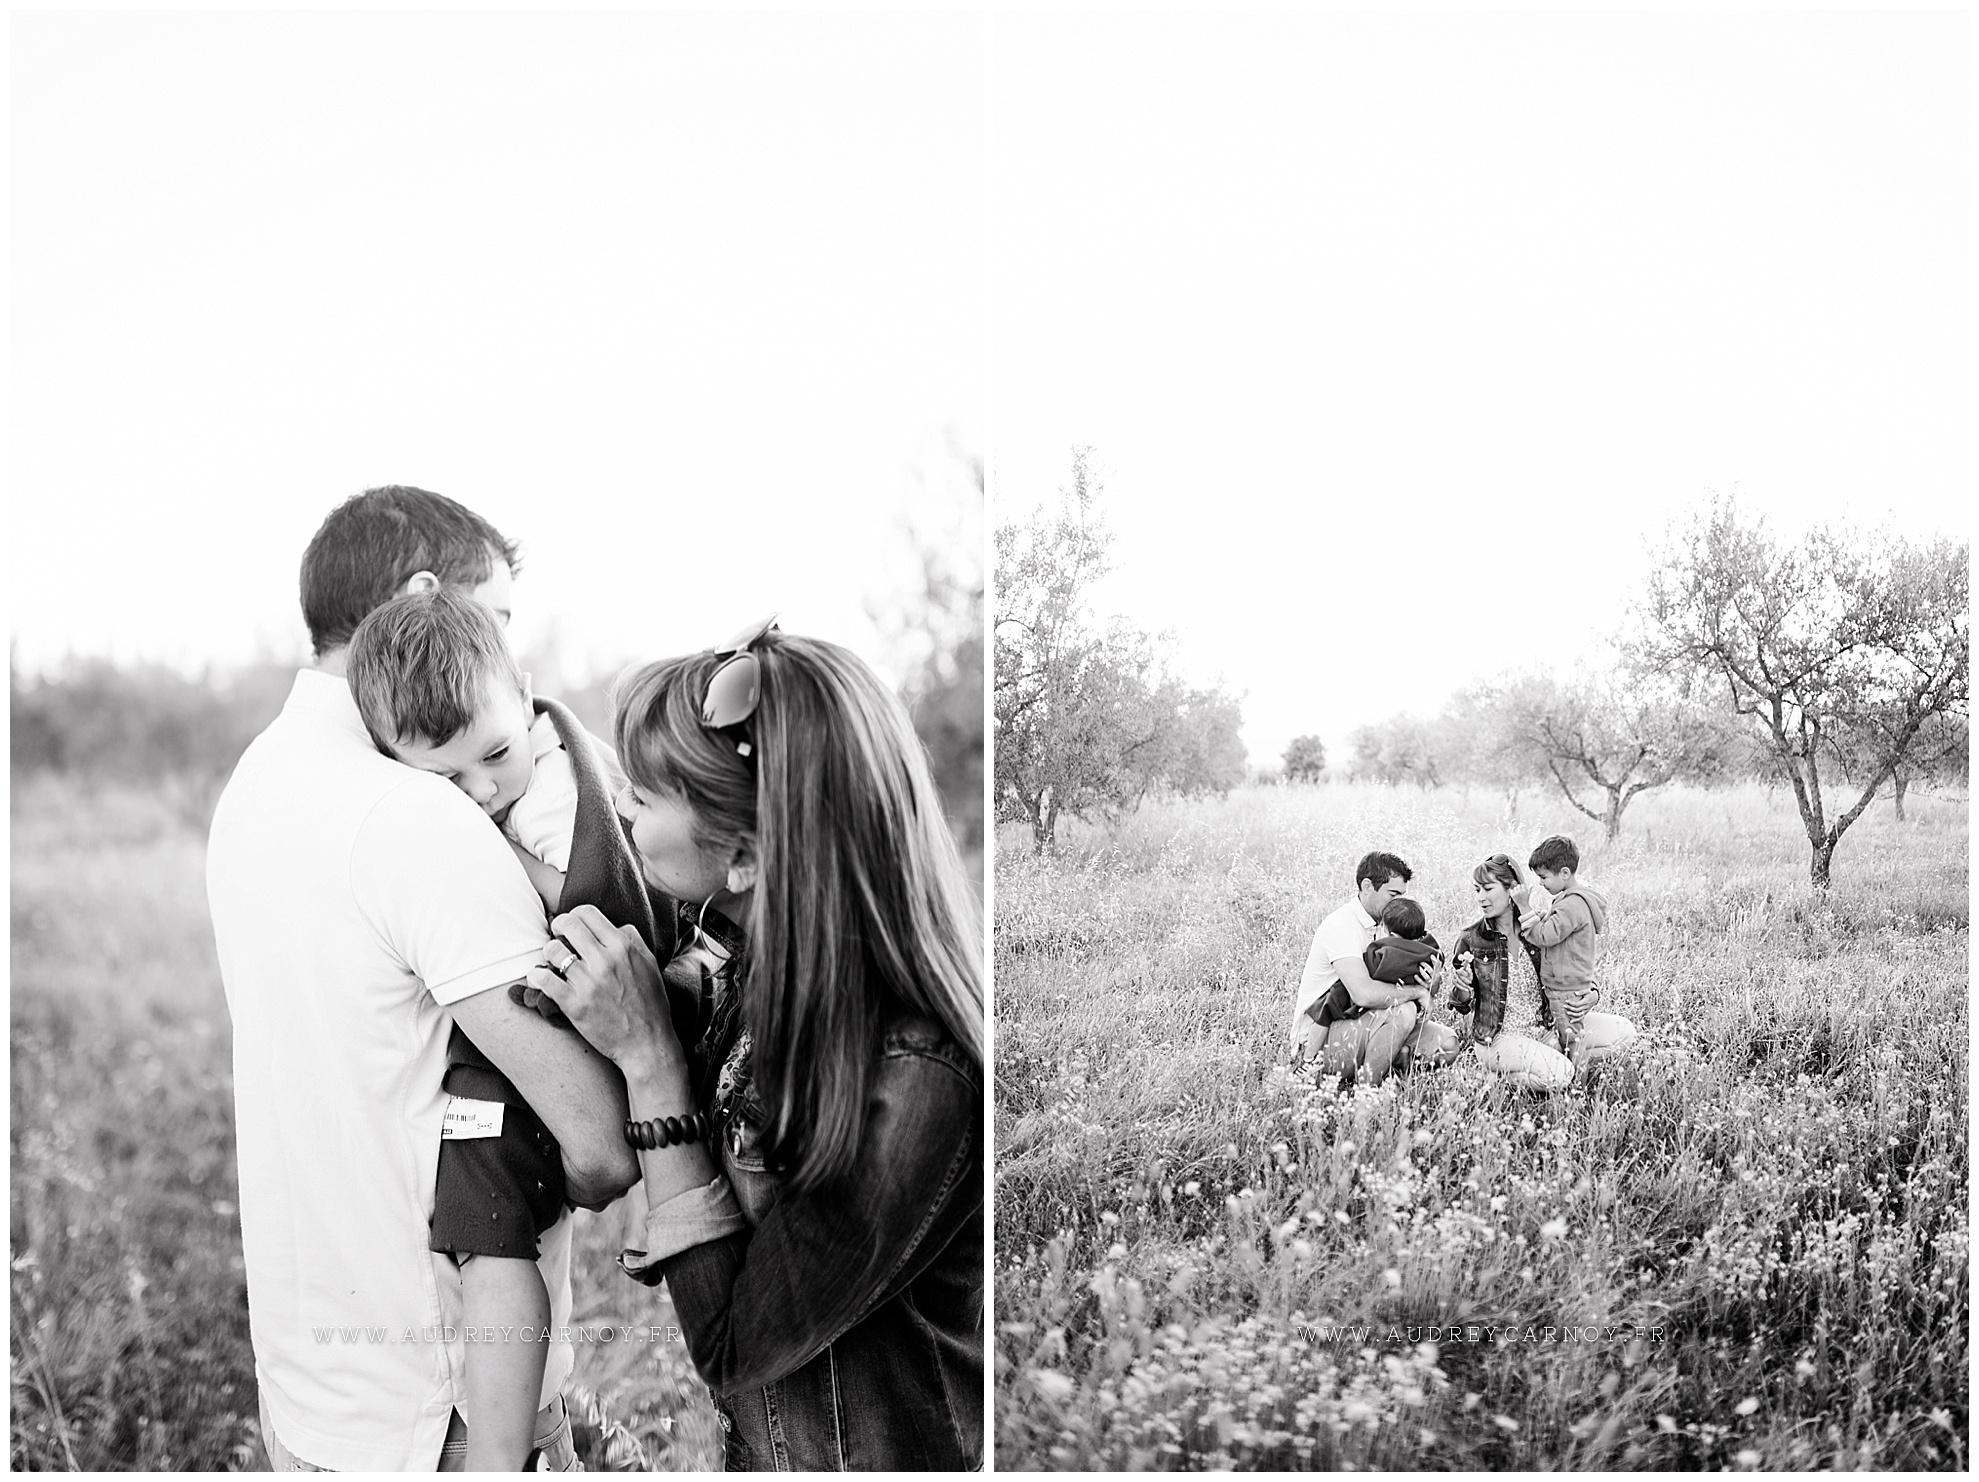 Séance famille - Valensole | Nathalie 3